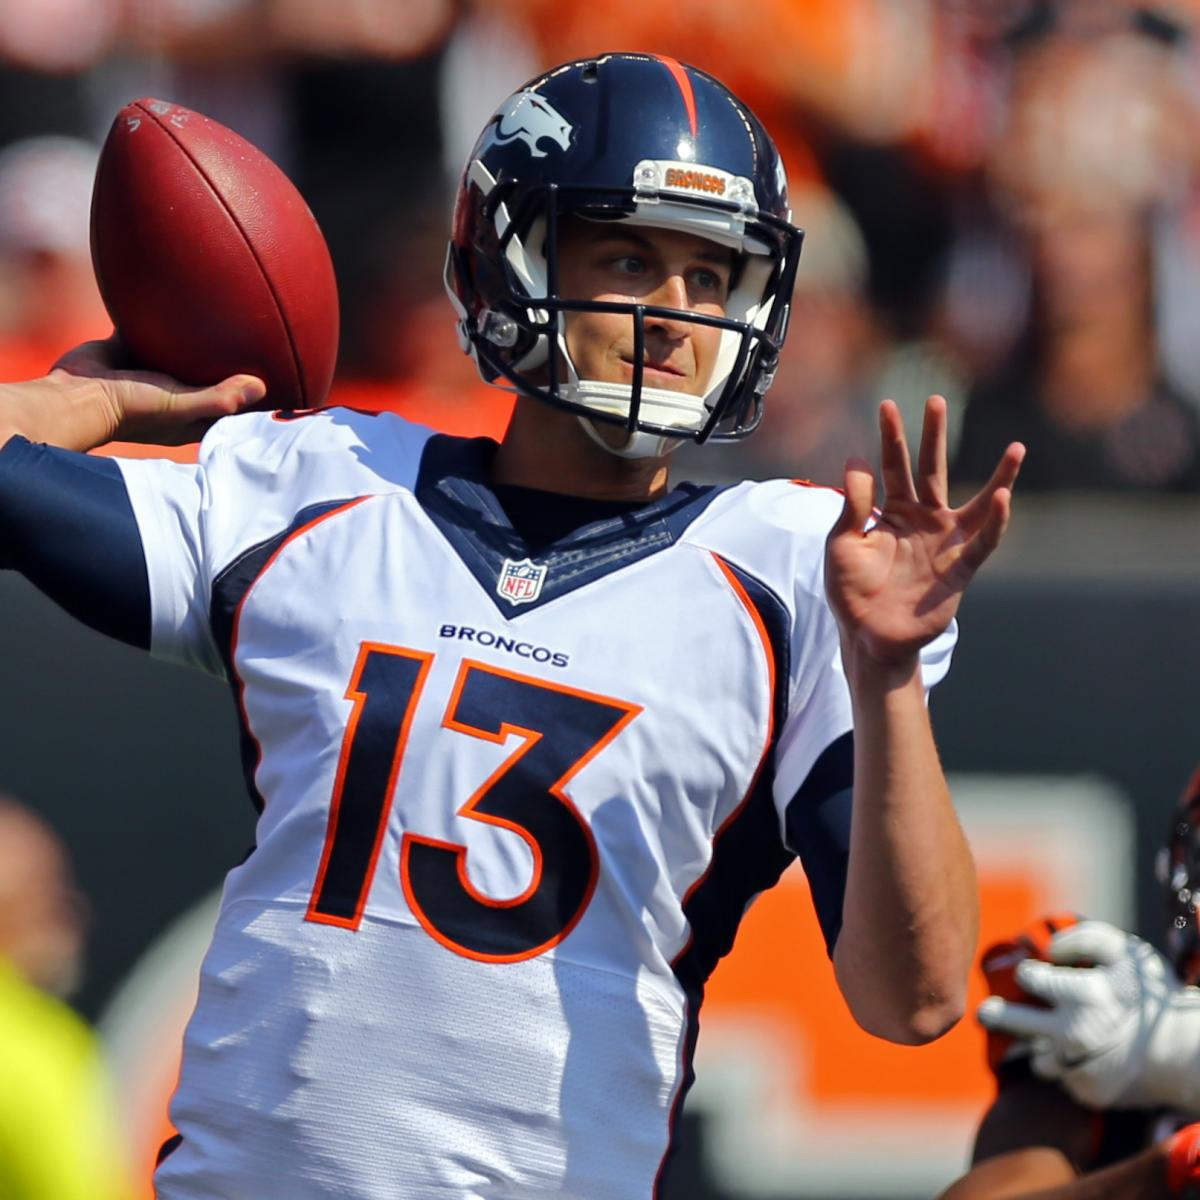 Denver News Road Conditions: Trevor Siemian's Development Making Denver Broncos AFC